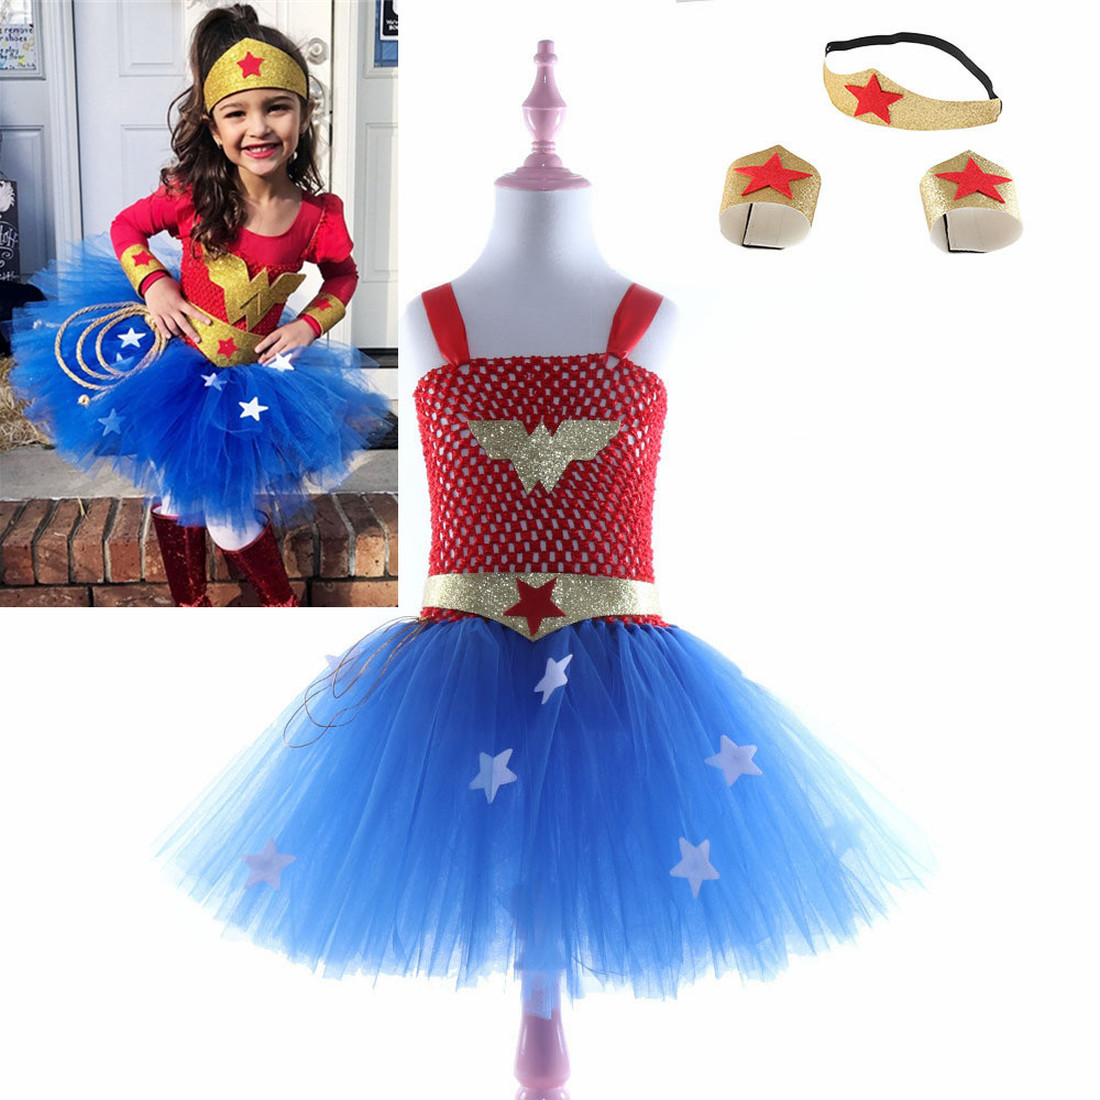 Children's Hero tutu Dress Purim Baby Girls Birthday Party Clothes Superhero Girl Cosplay Costume for Kids Cute Princess Dresses